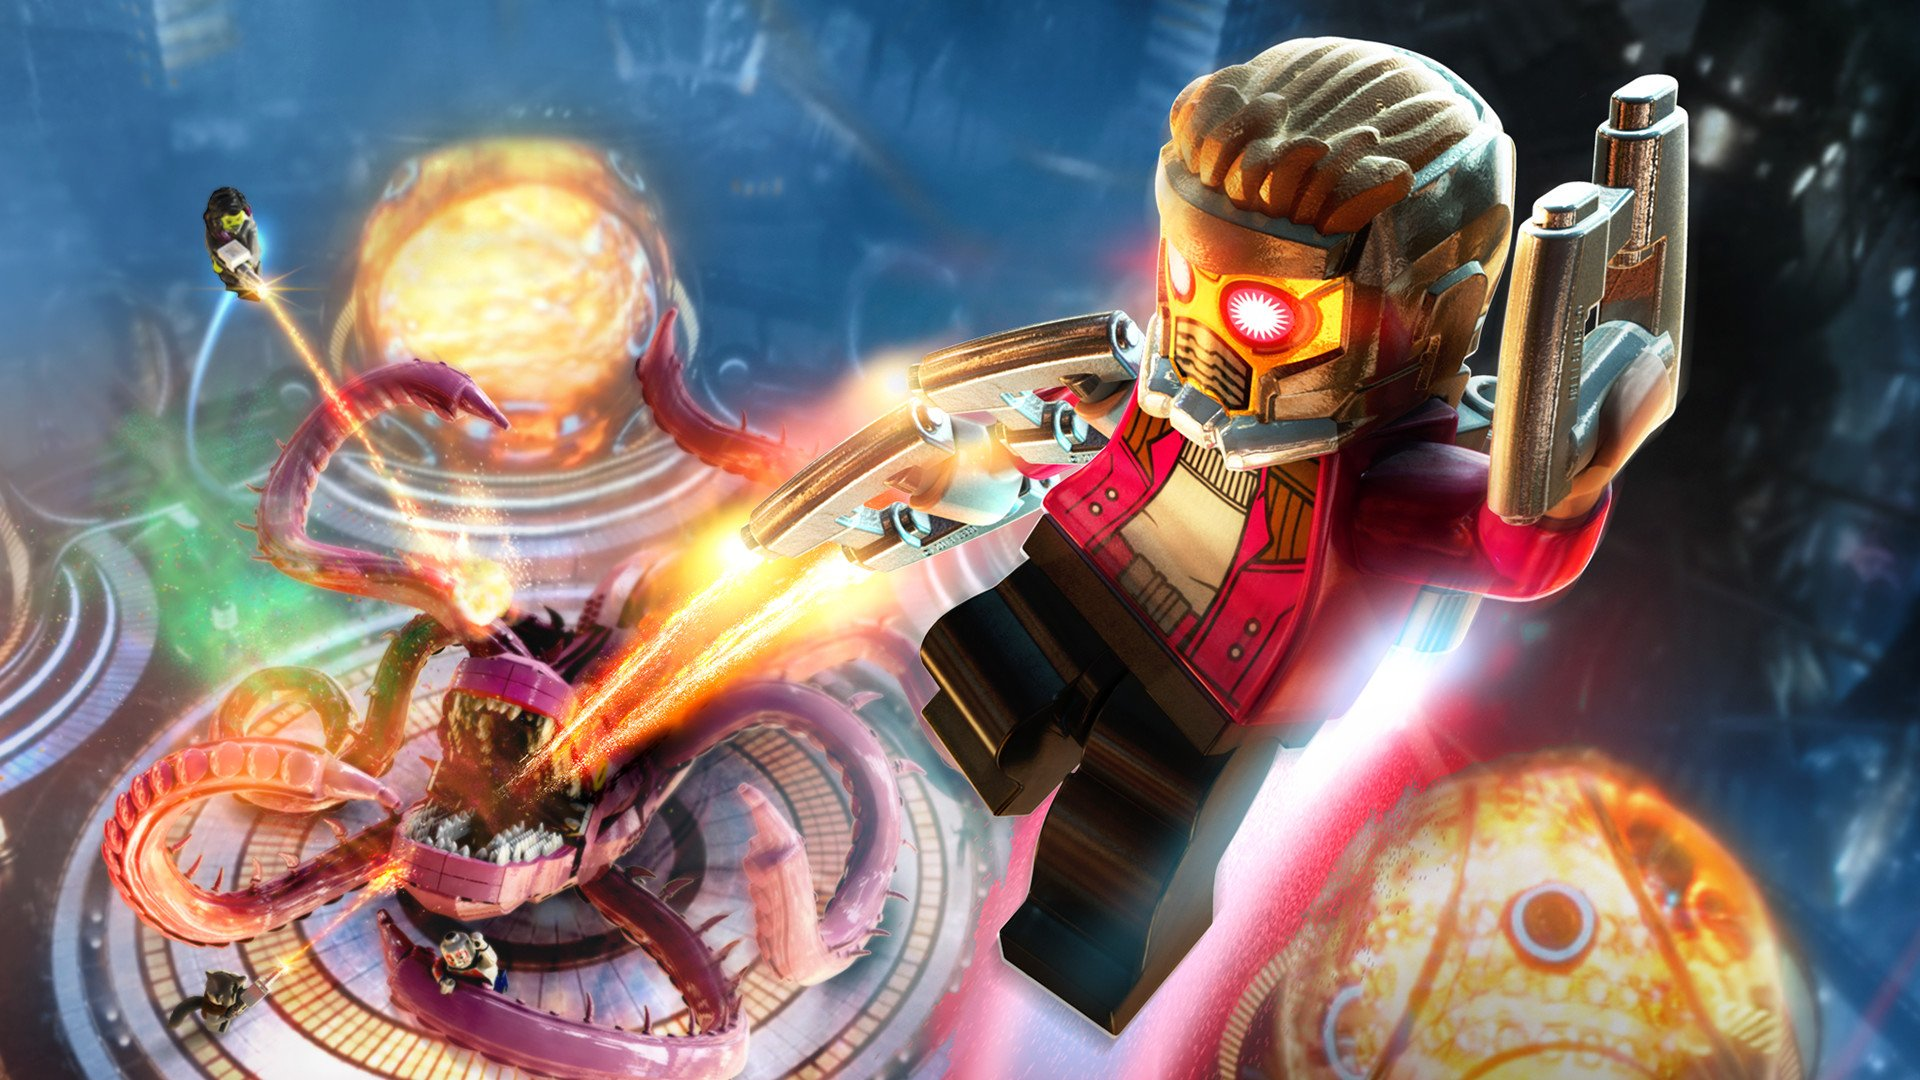 LEGO Marvel Super Heroes 2 - Guardians of the Galaxy Vol 2